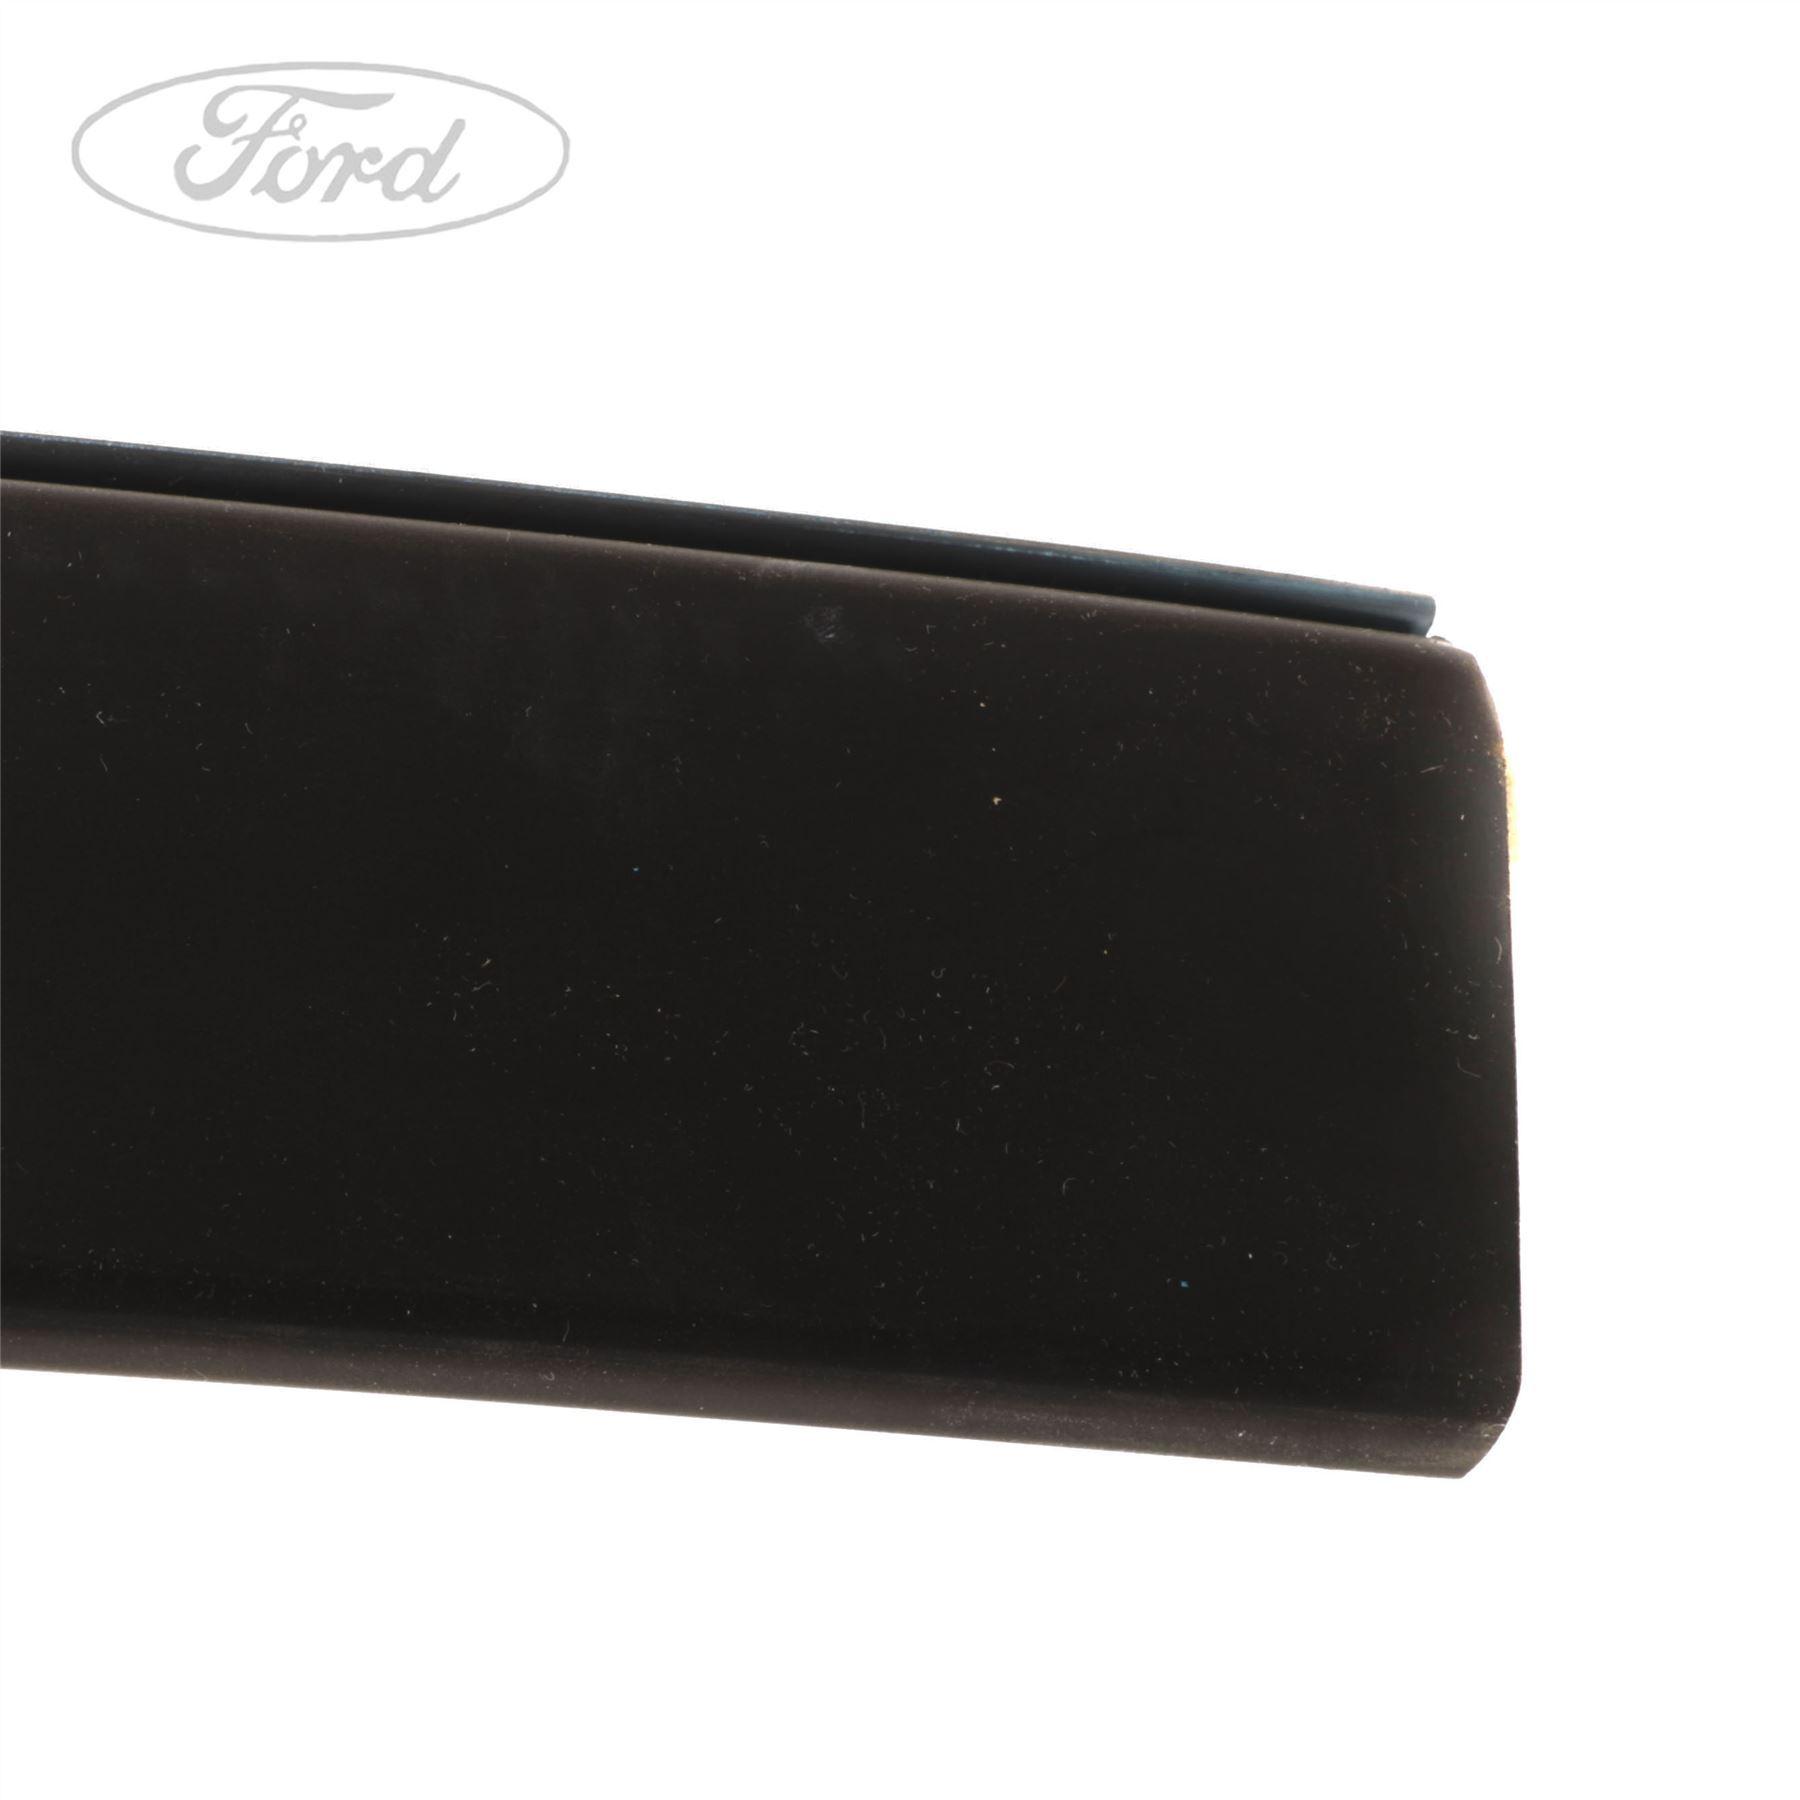 Genuine Ford Focus MK1 Front Bumper Stone Deflector 1144014